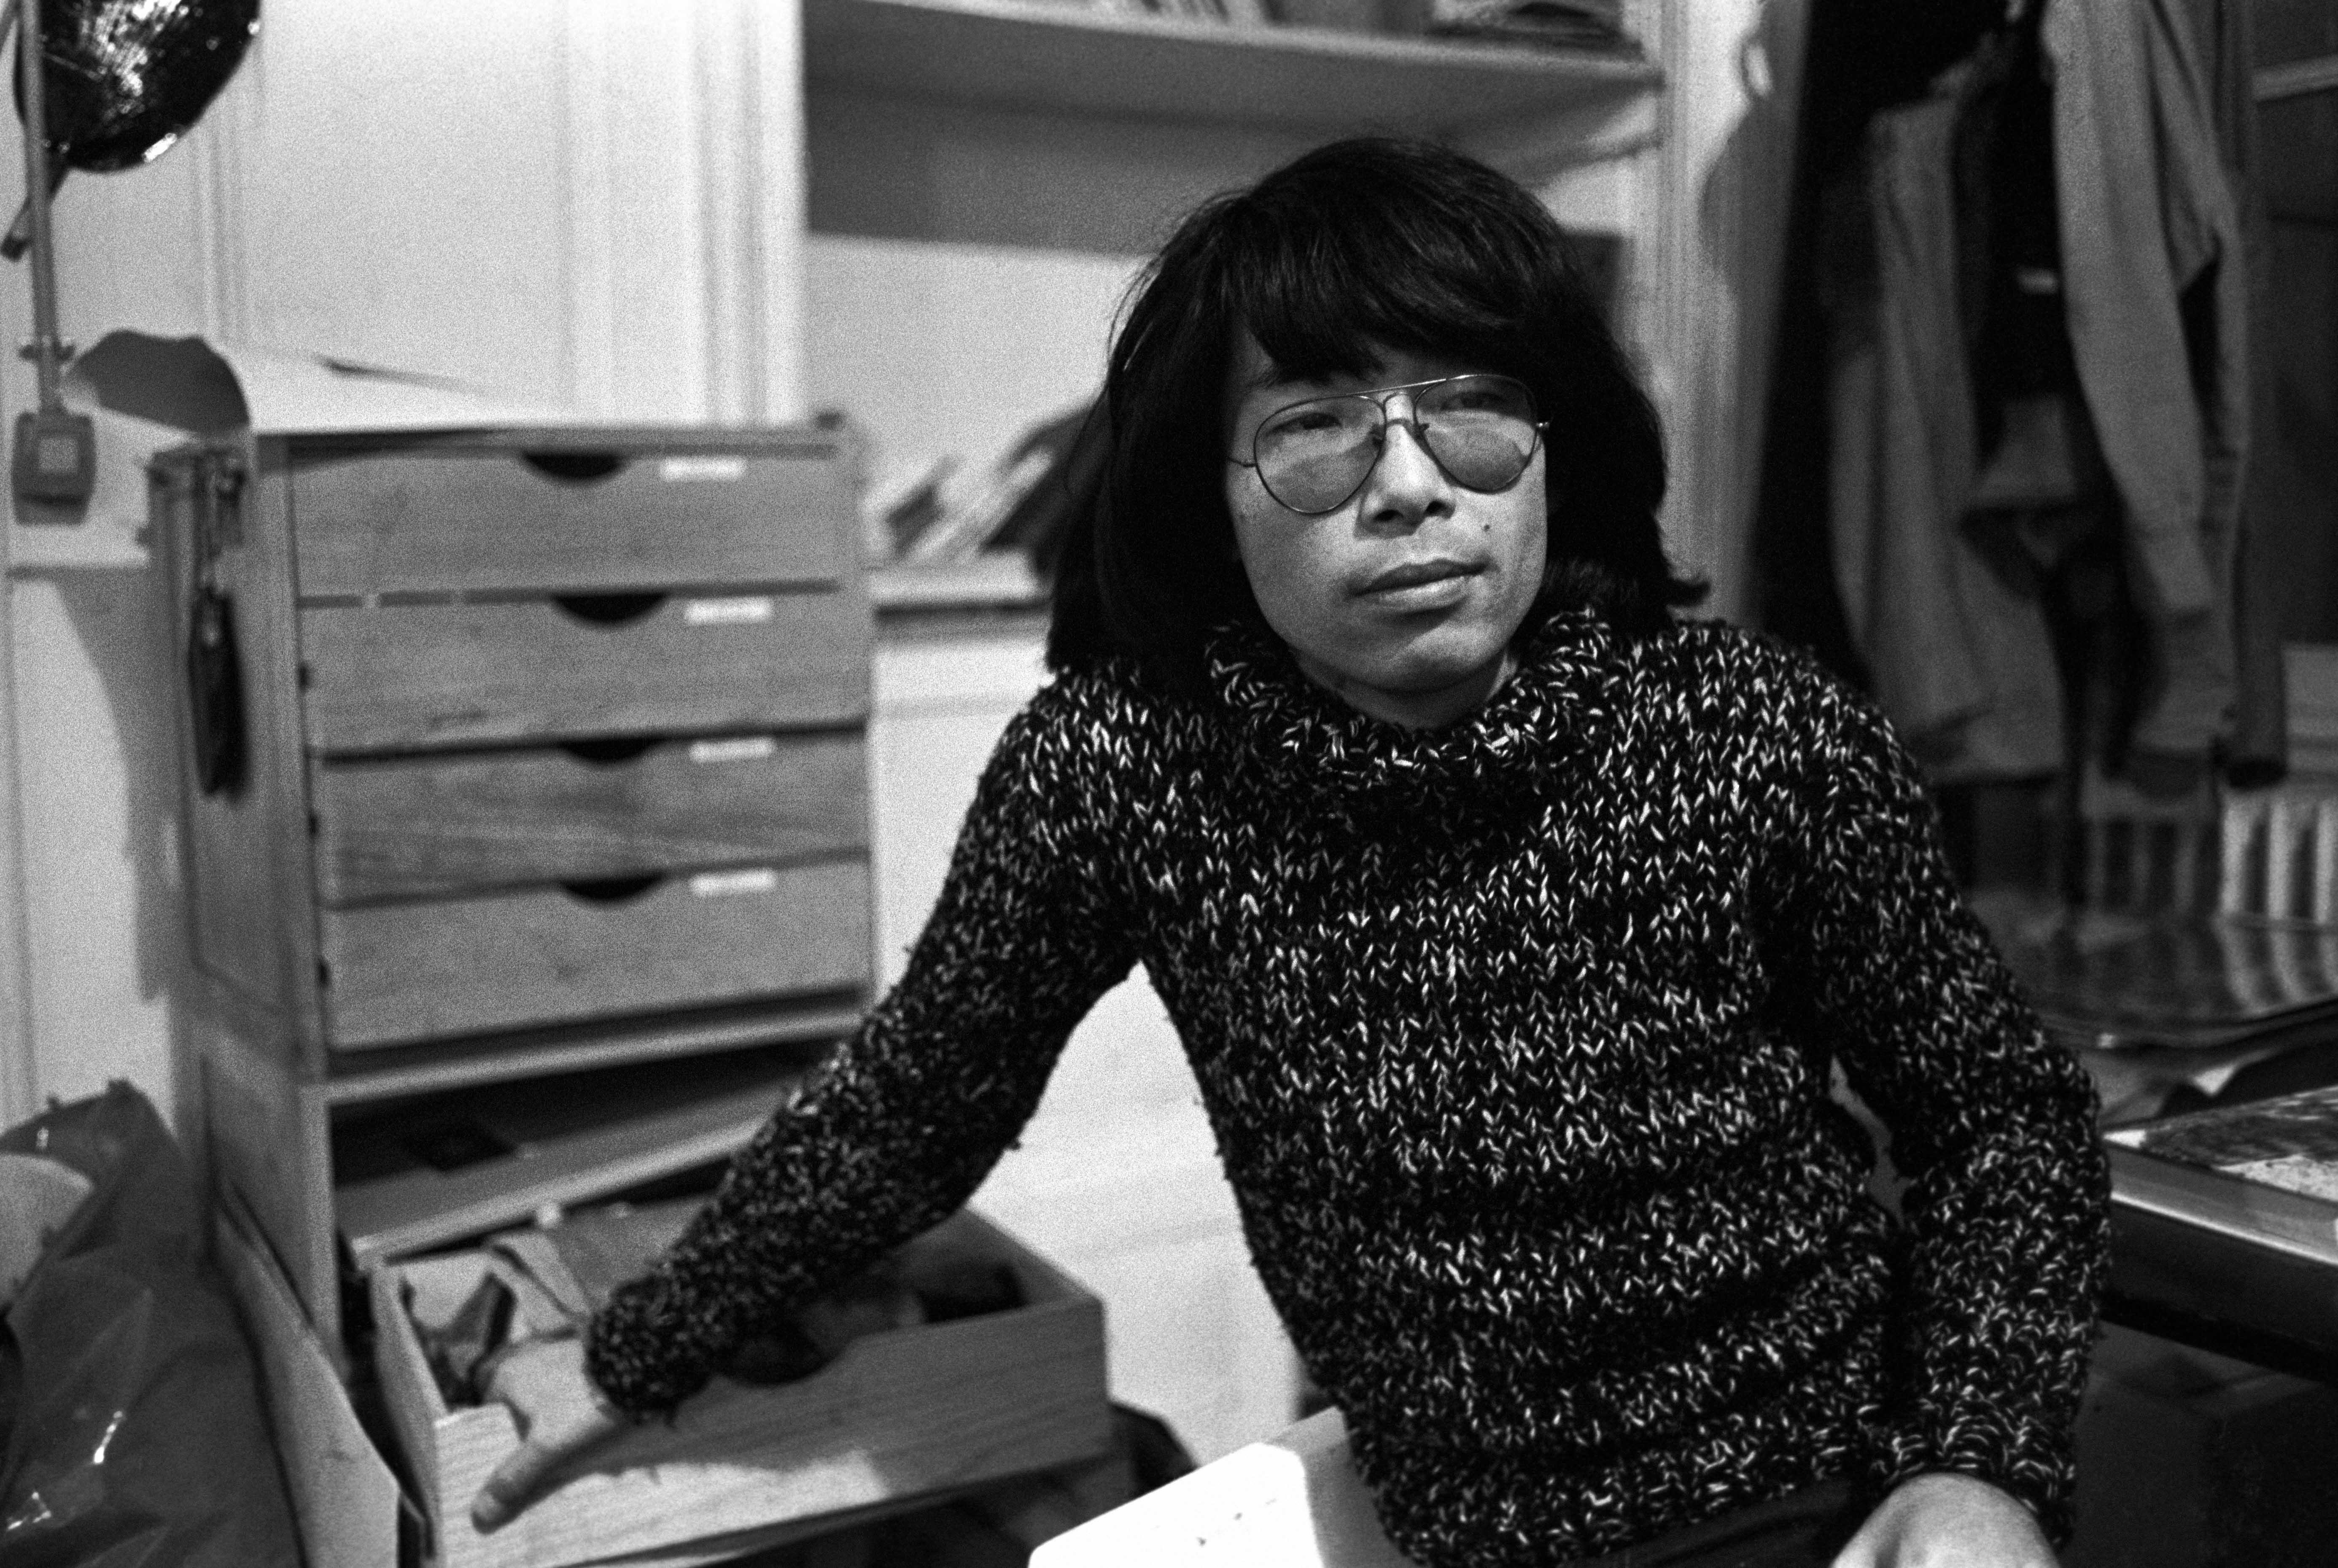 Kenzo Takada in his atelier, 1973.